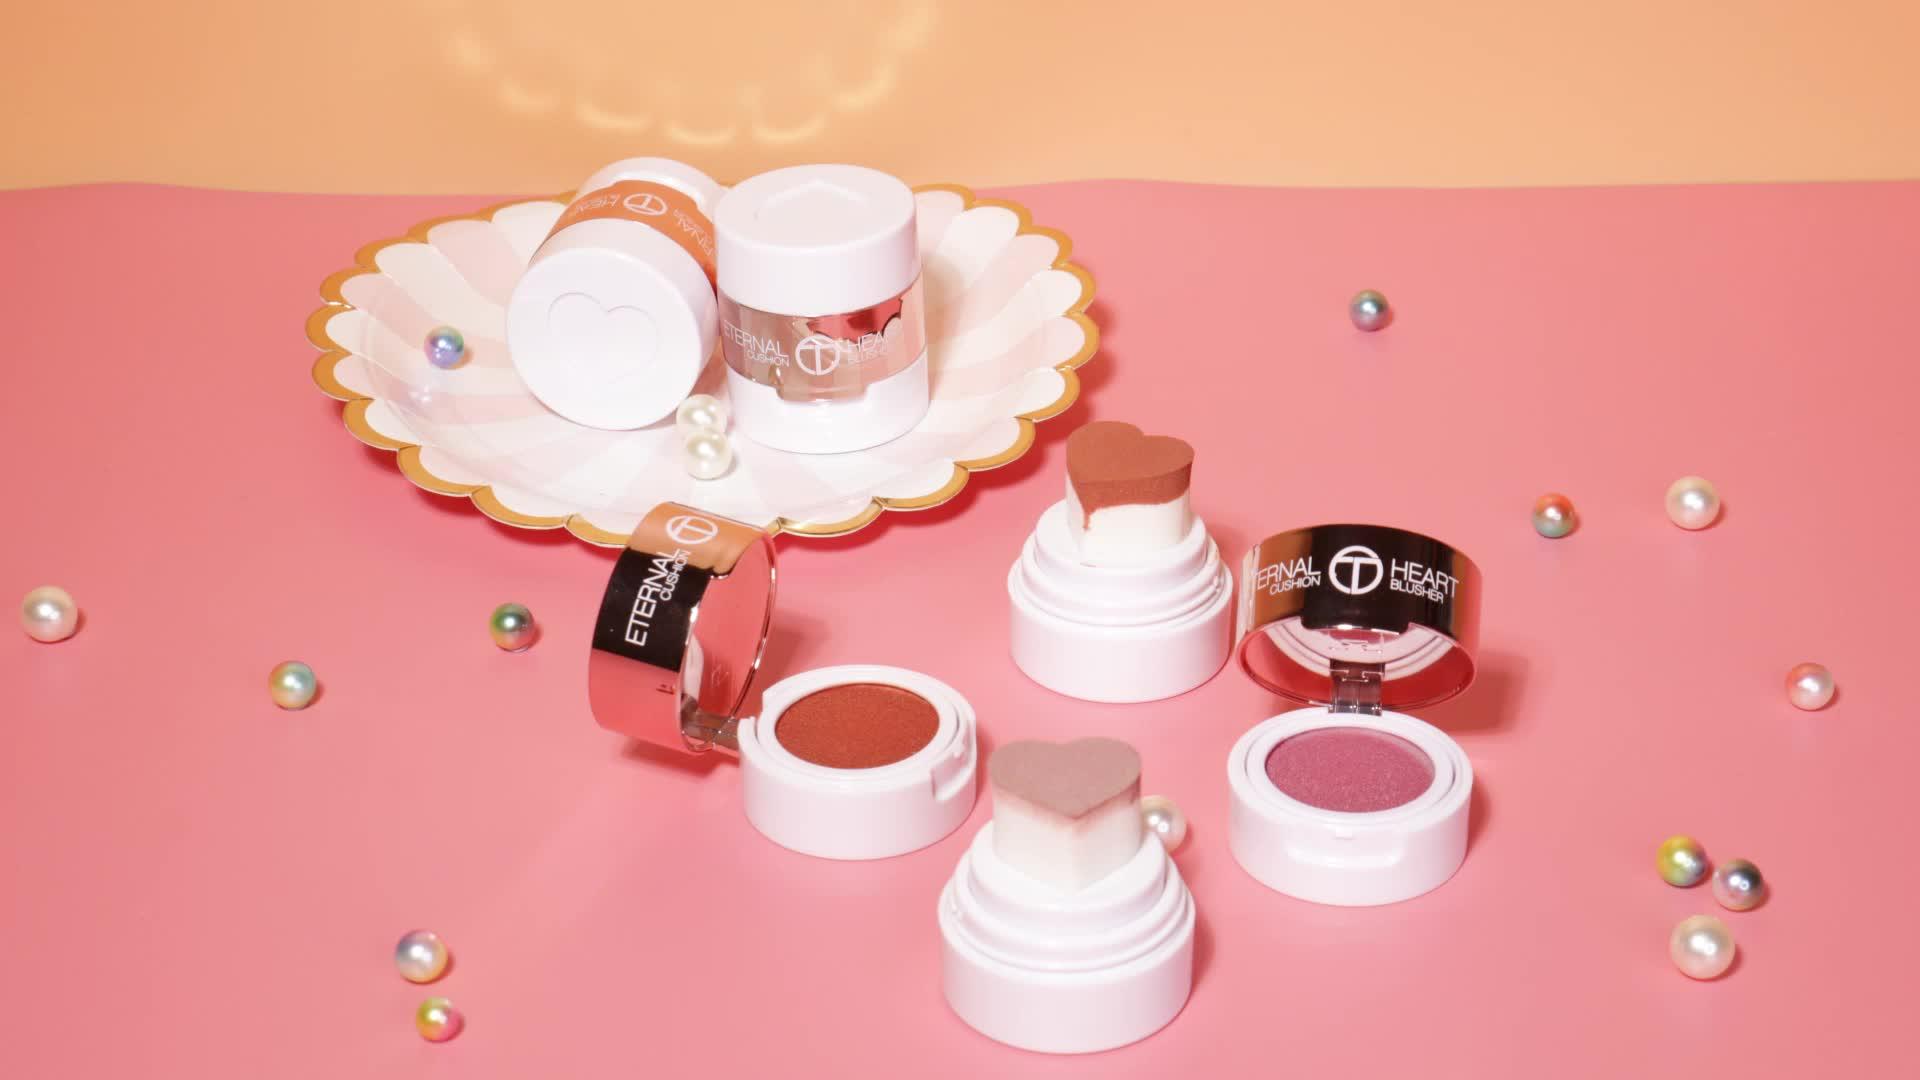 O. TWO. O maquillage nouvelle arrivée asie vente chaude coussin Blush